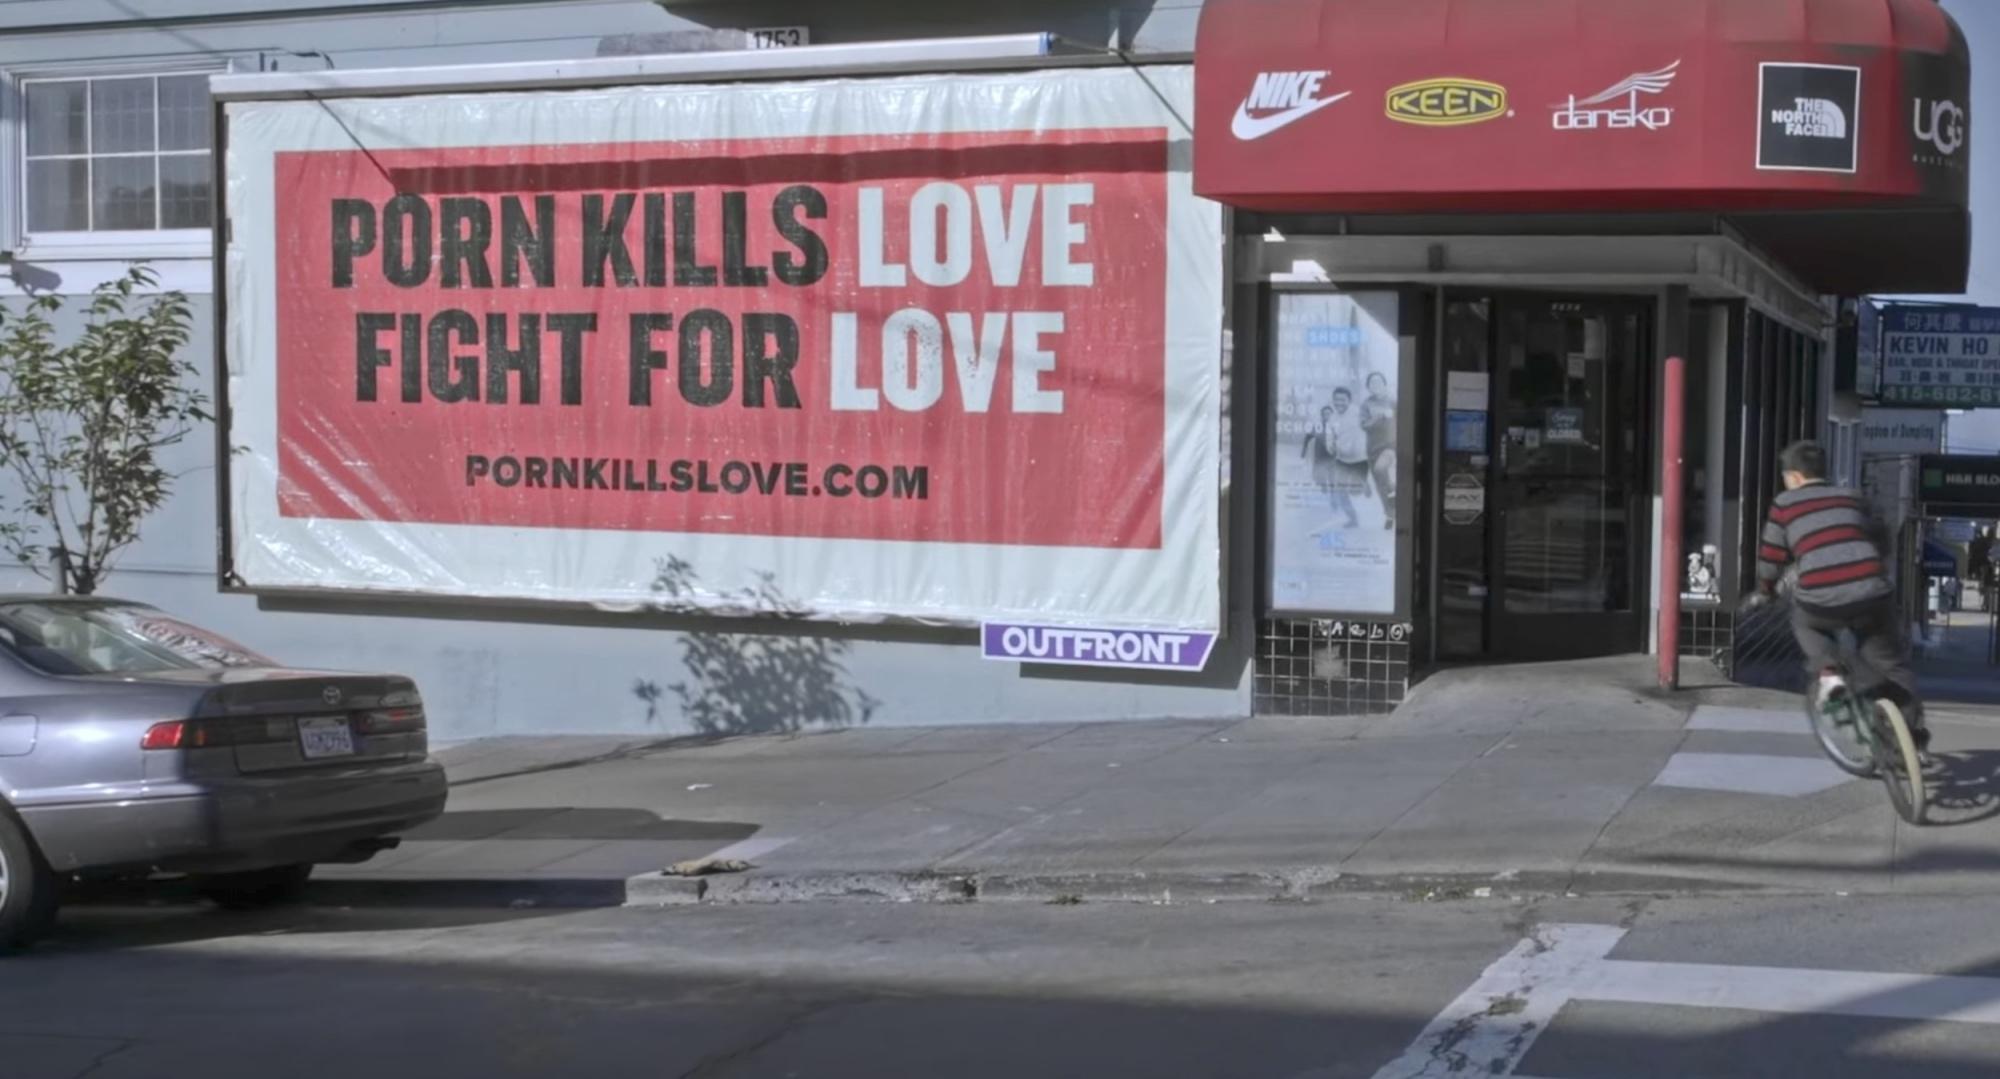 VIDEO: The 'Porn Kills Love' Street Team — Changing the Conversation